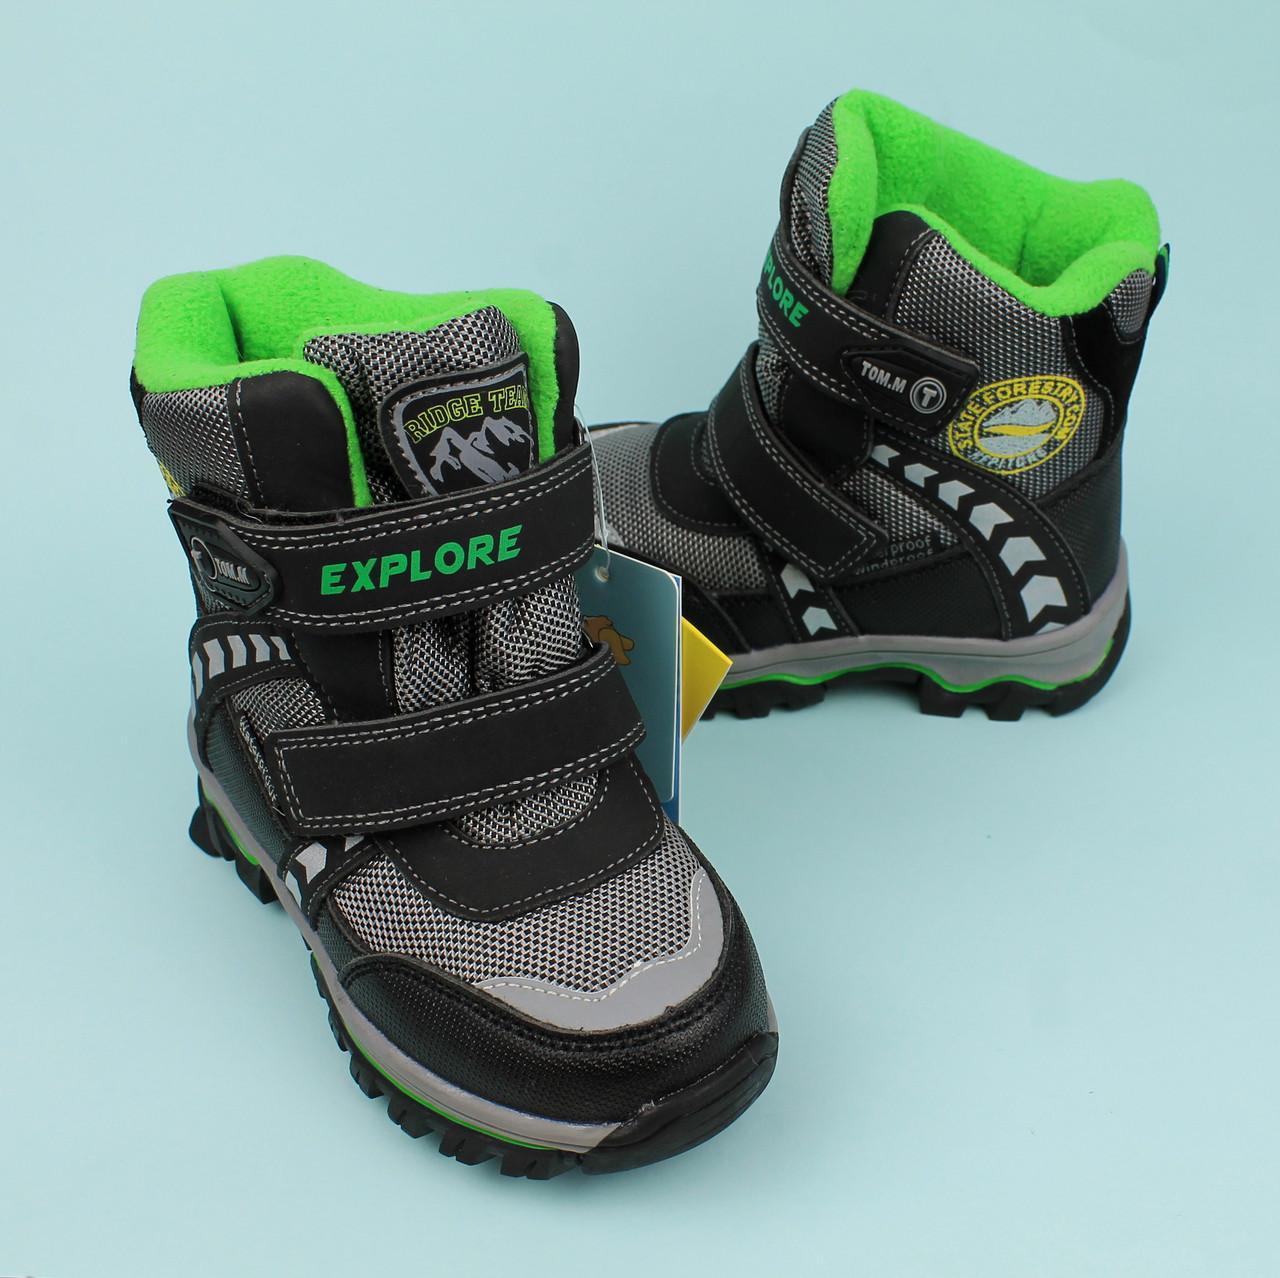 Термо ботинки две липучки на мальчика тм Том.м размер 23,25,26,27